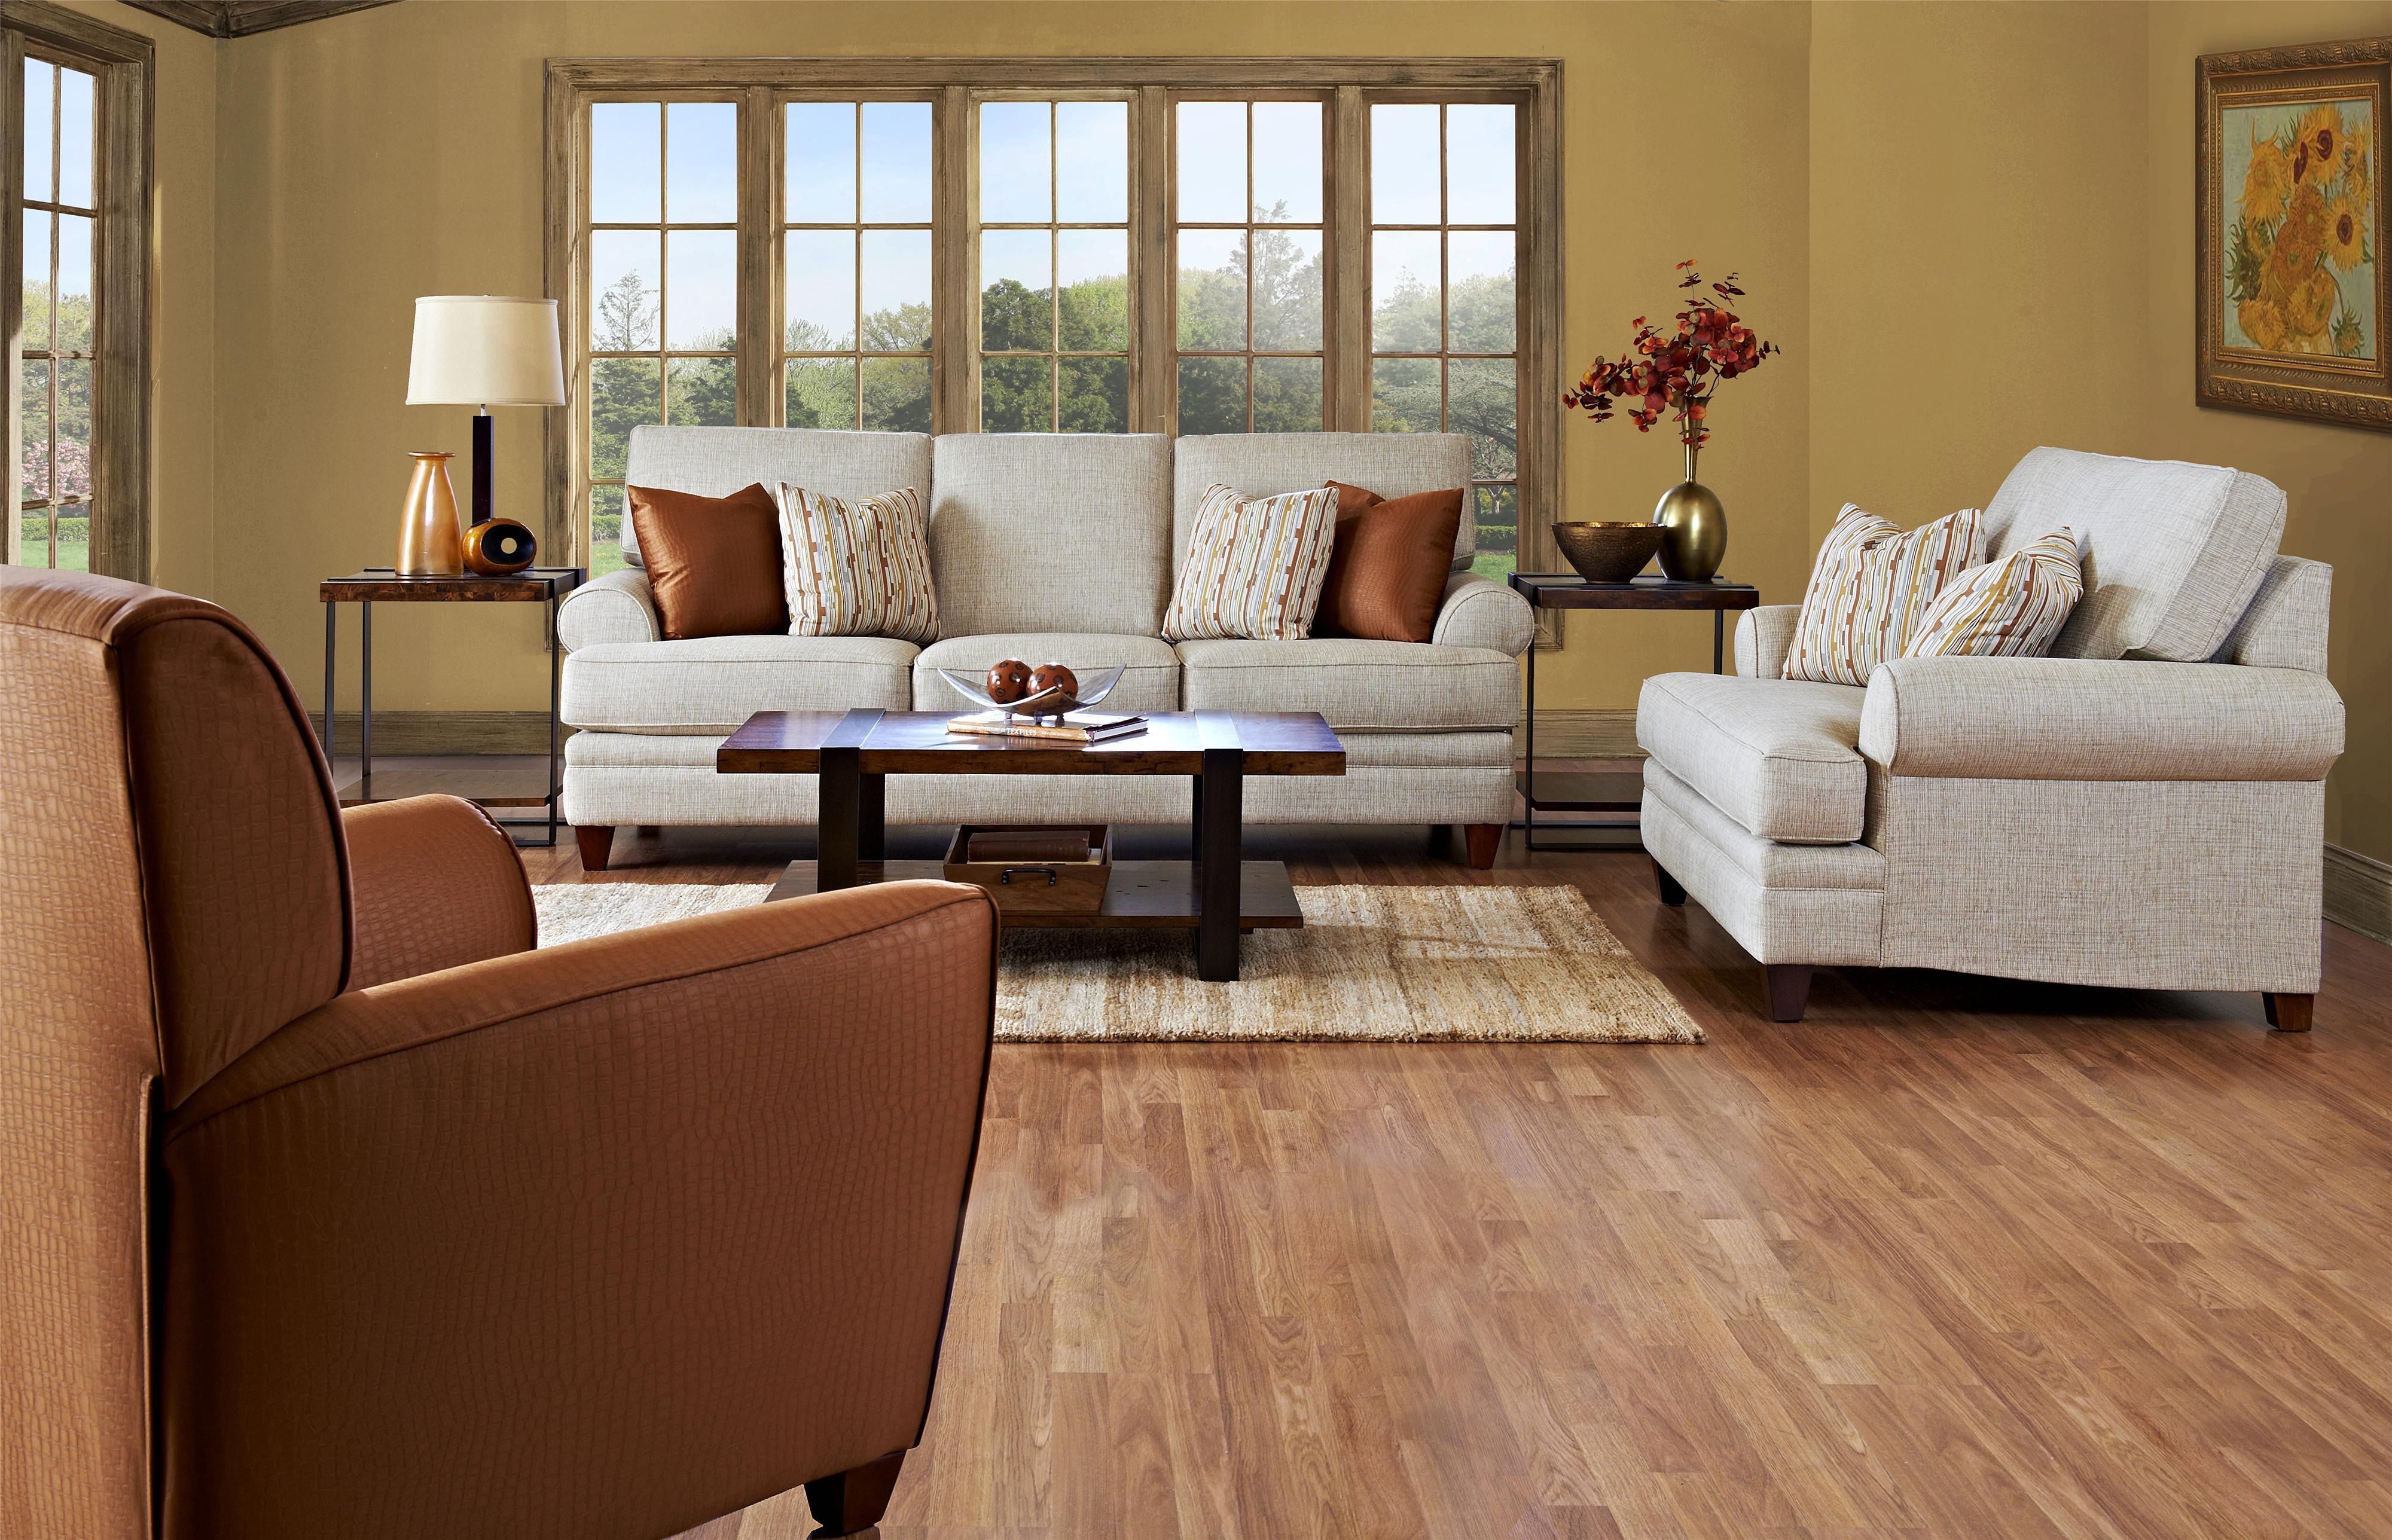 Klaussner Fresno Stationary Living Room Group Dunk